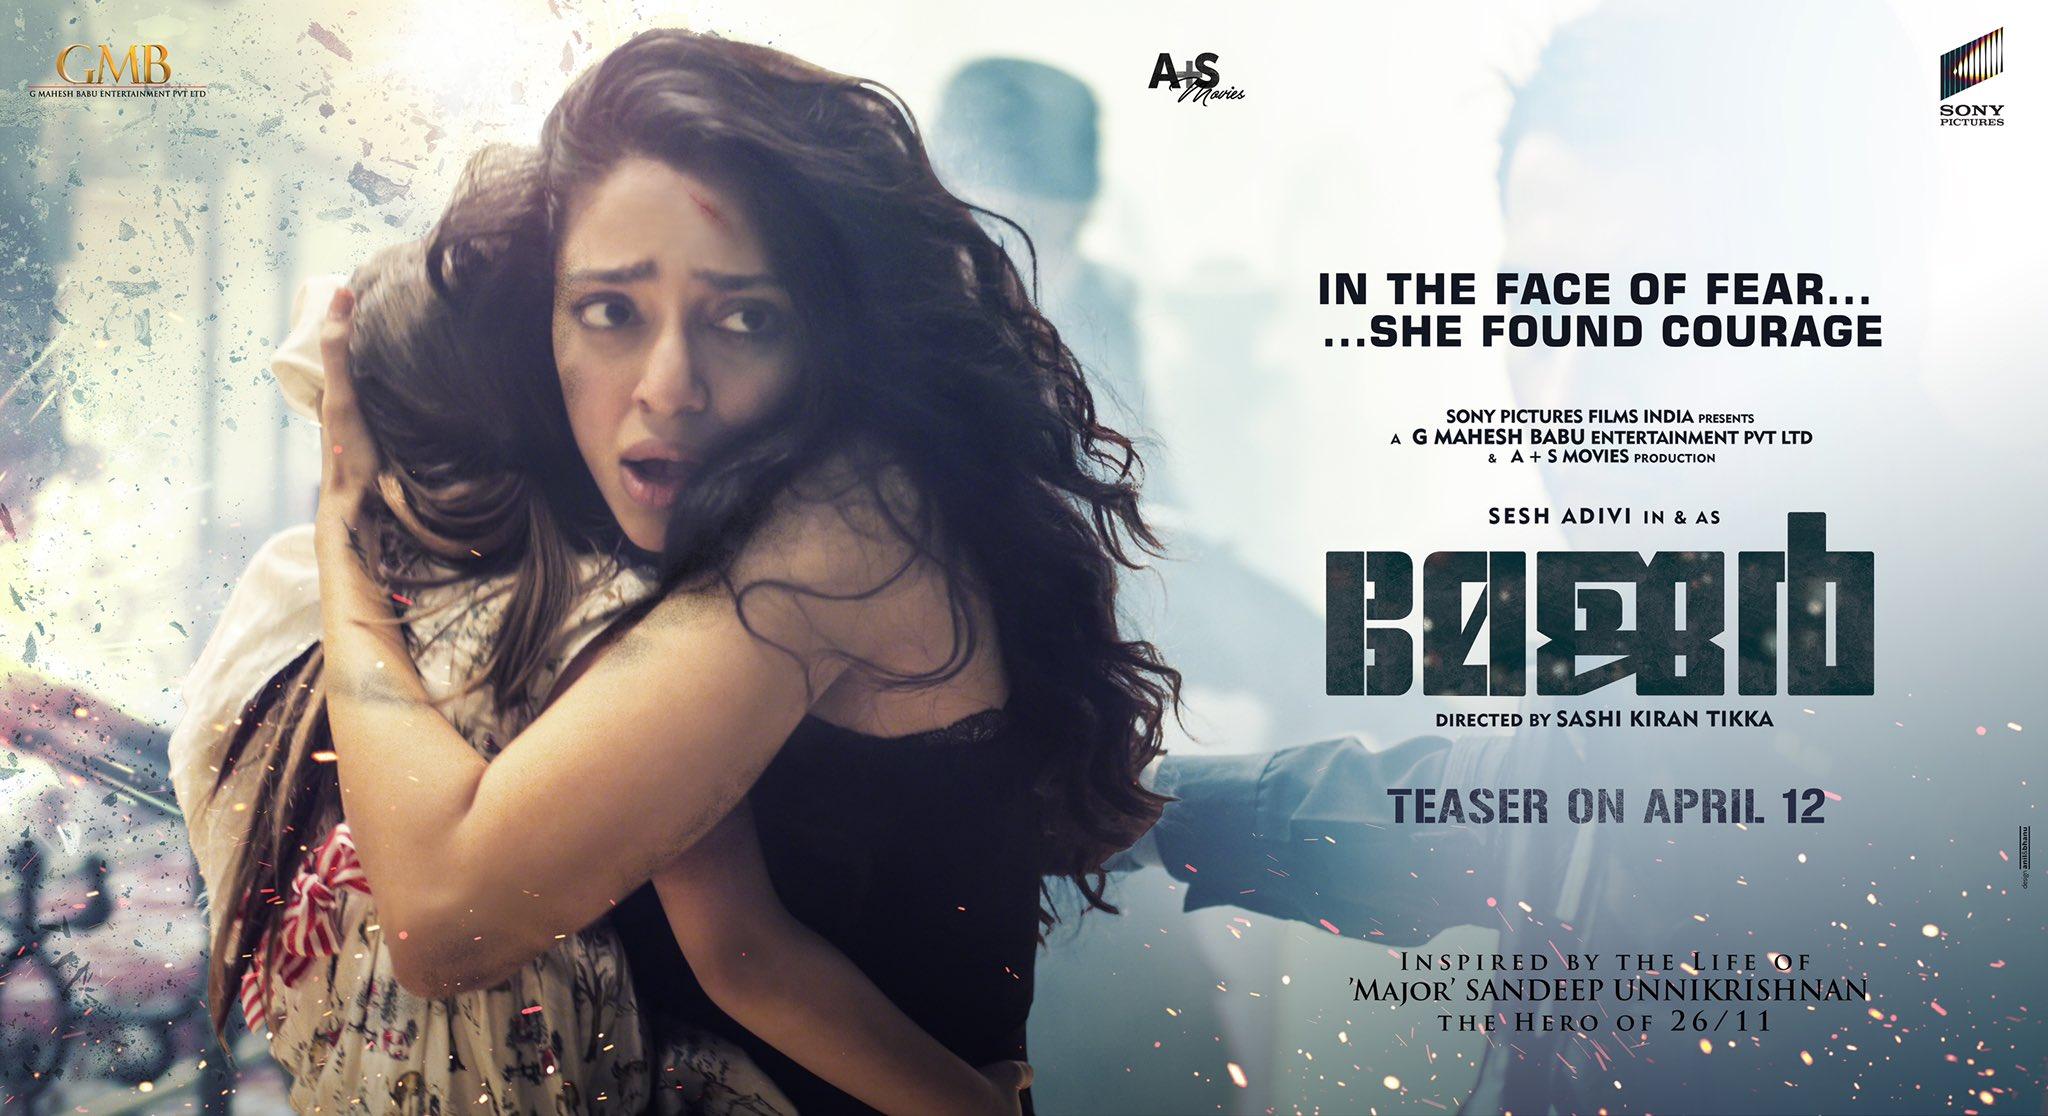 Major Movie Sobhita Dhulipala as the NRI hostage HD Posters